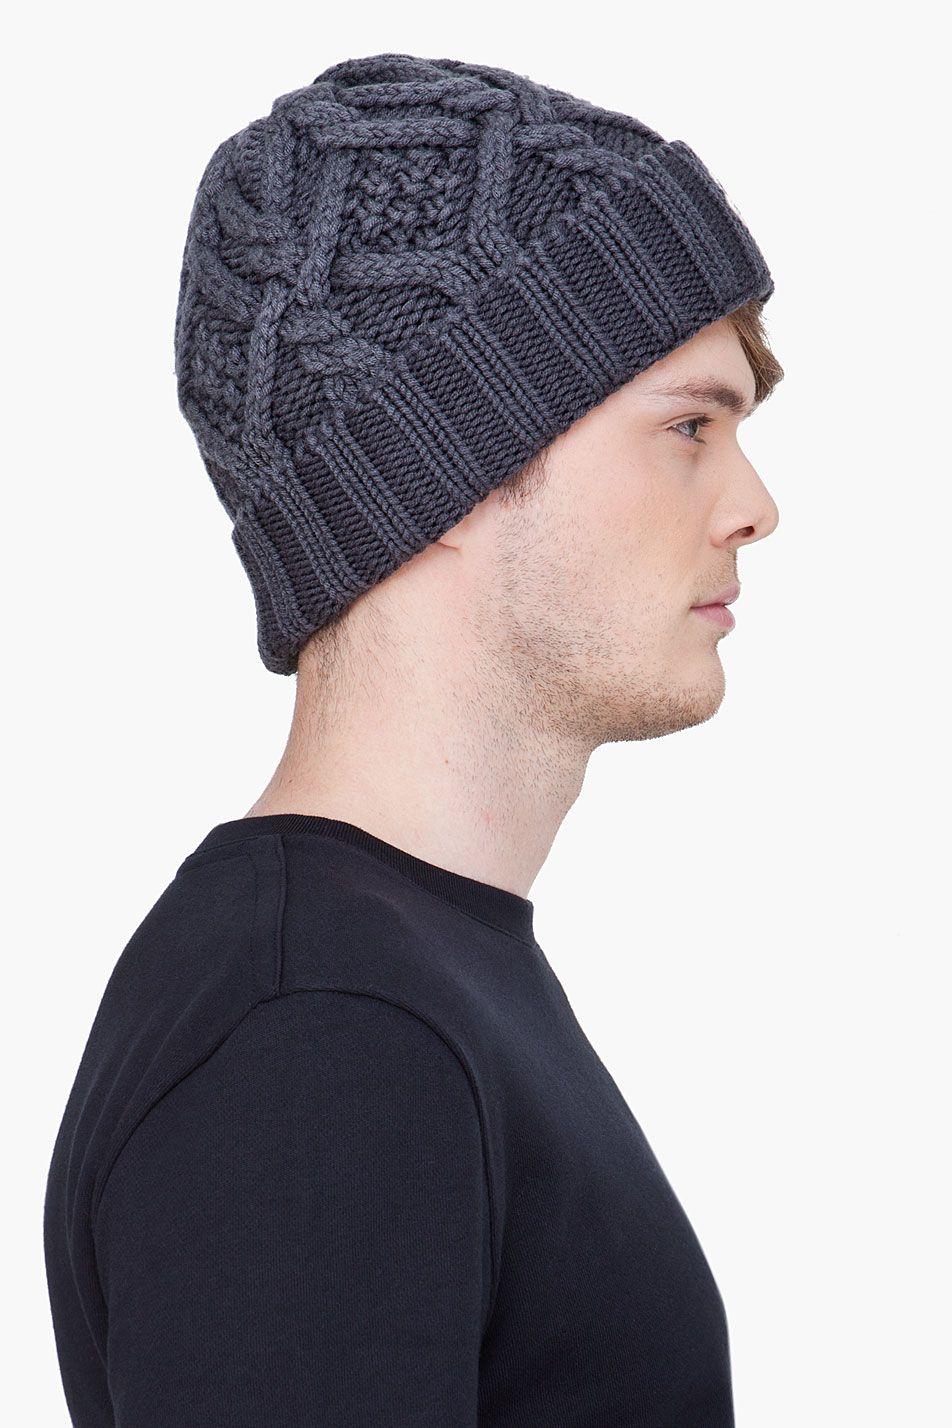 MONCLER grey Cable Knit beanie 17f886e70bd